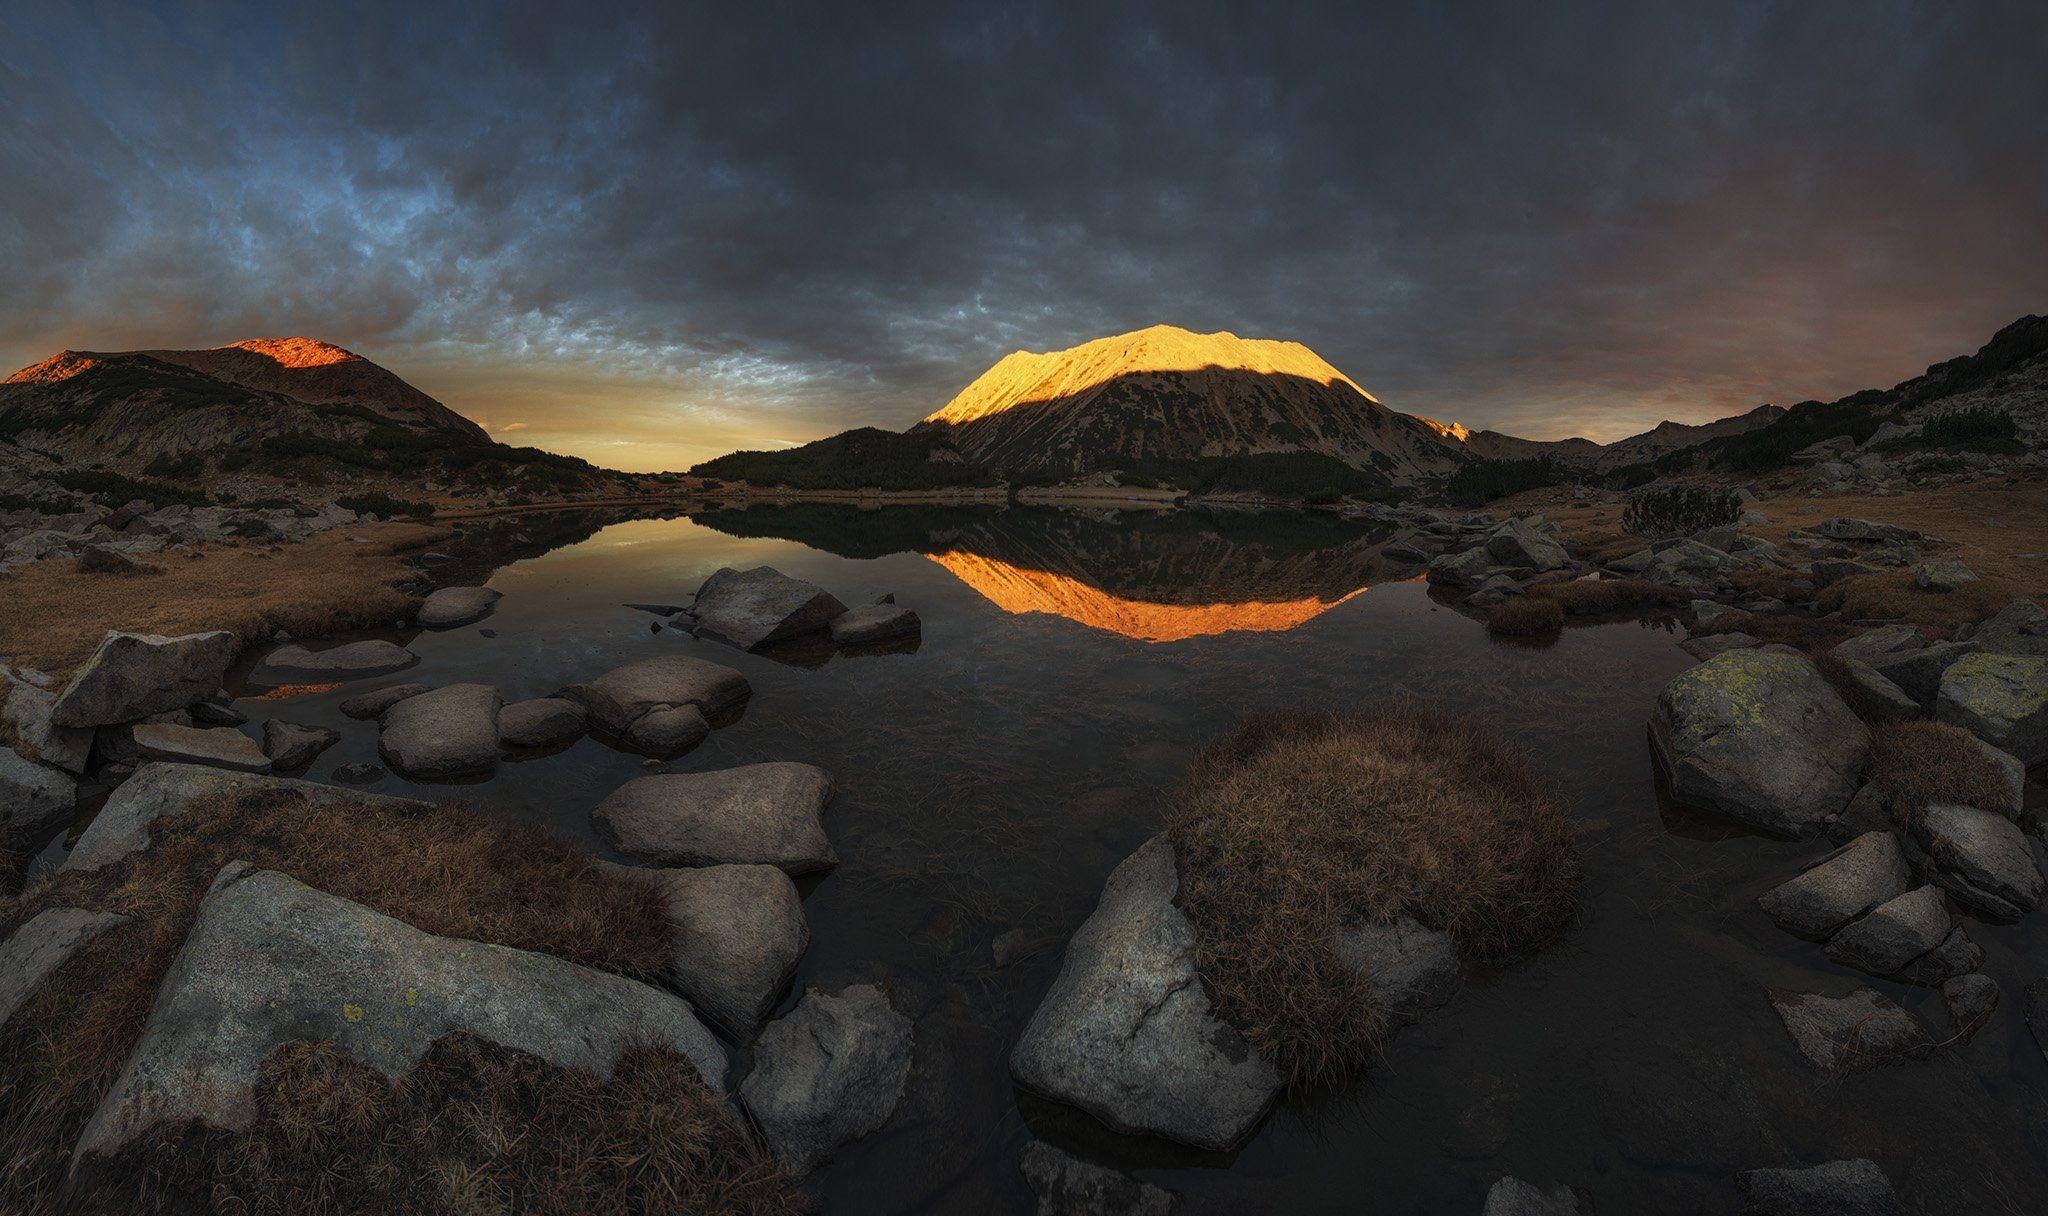 болгария, горы, закат, Краси Матаров